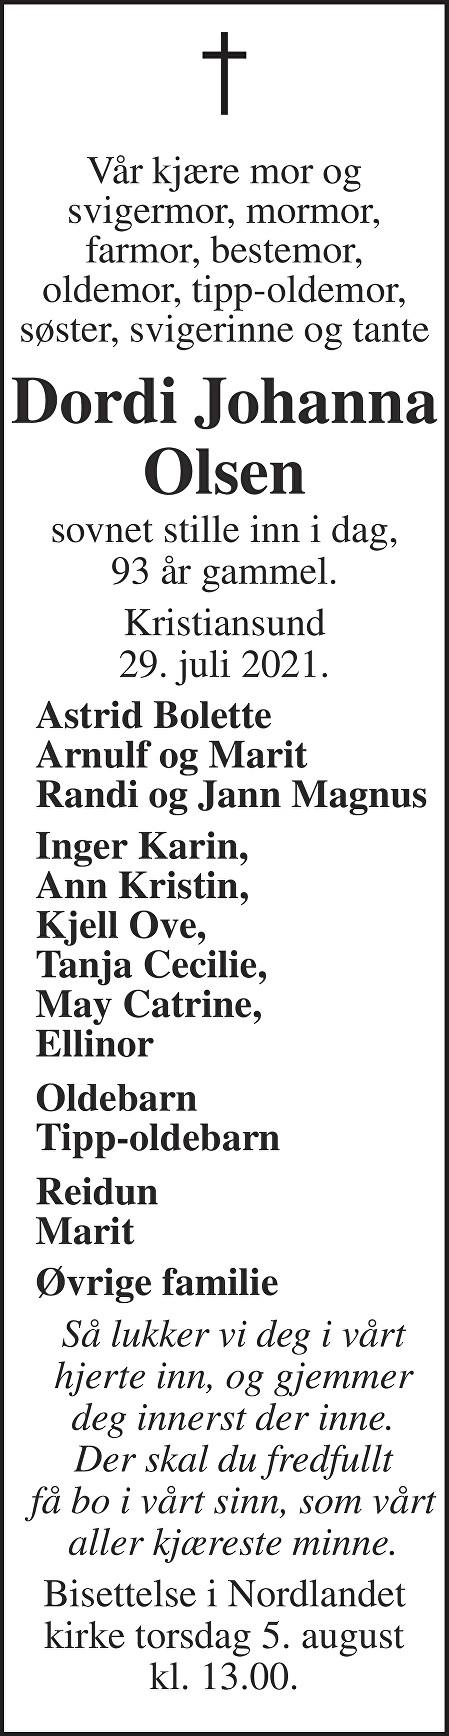 Dordi Johanna Olsen Dødsannonse